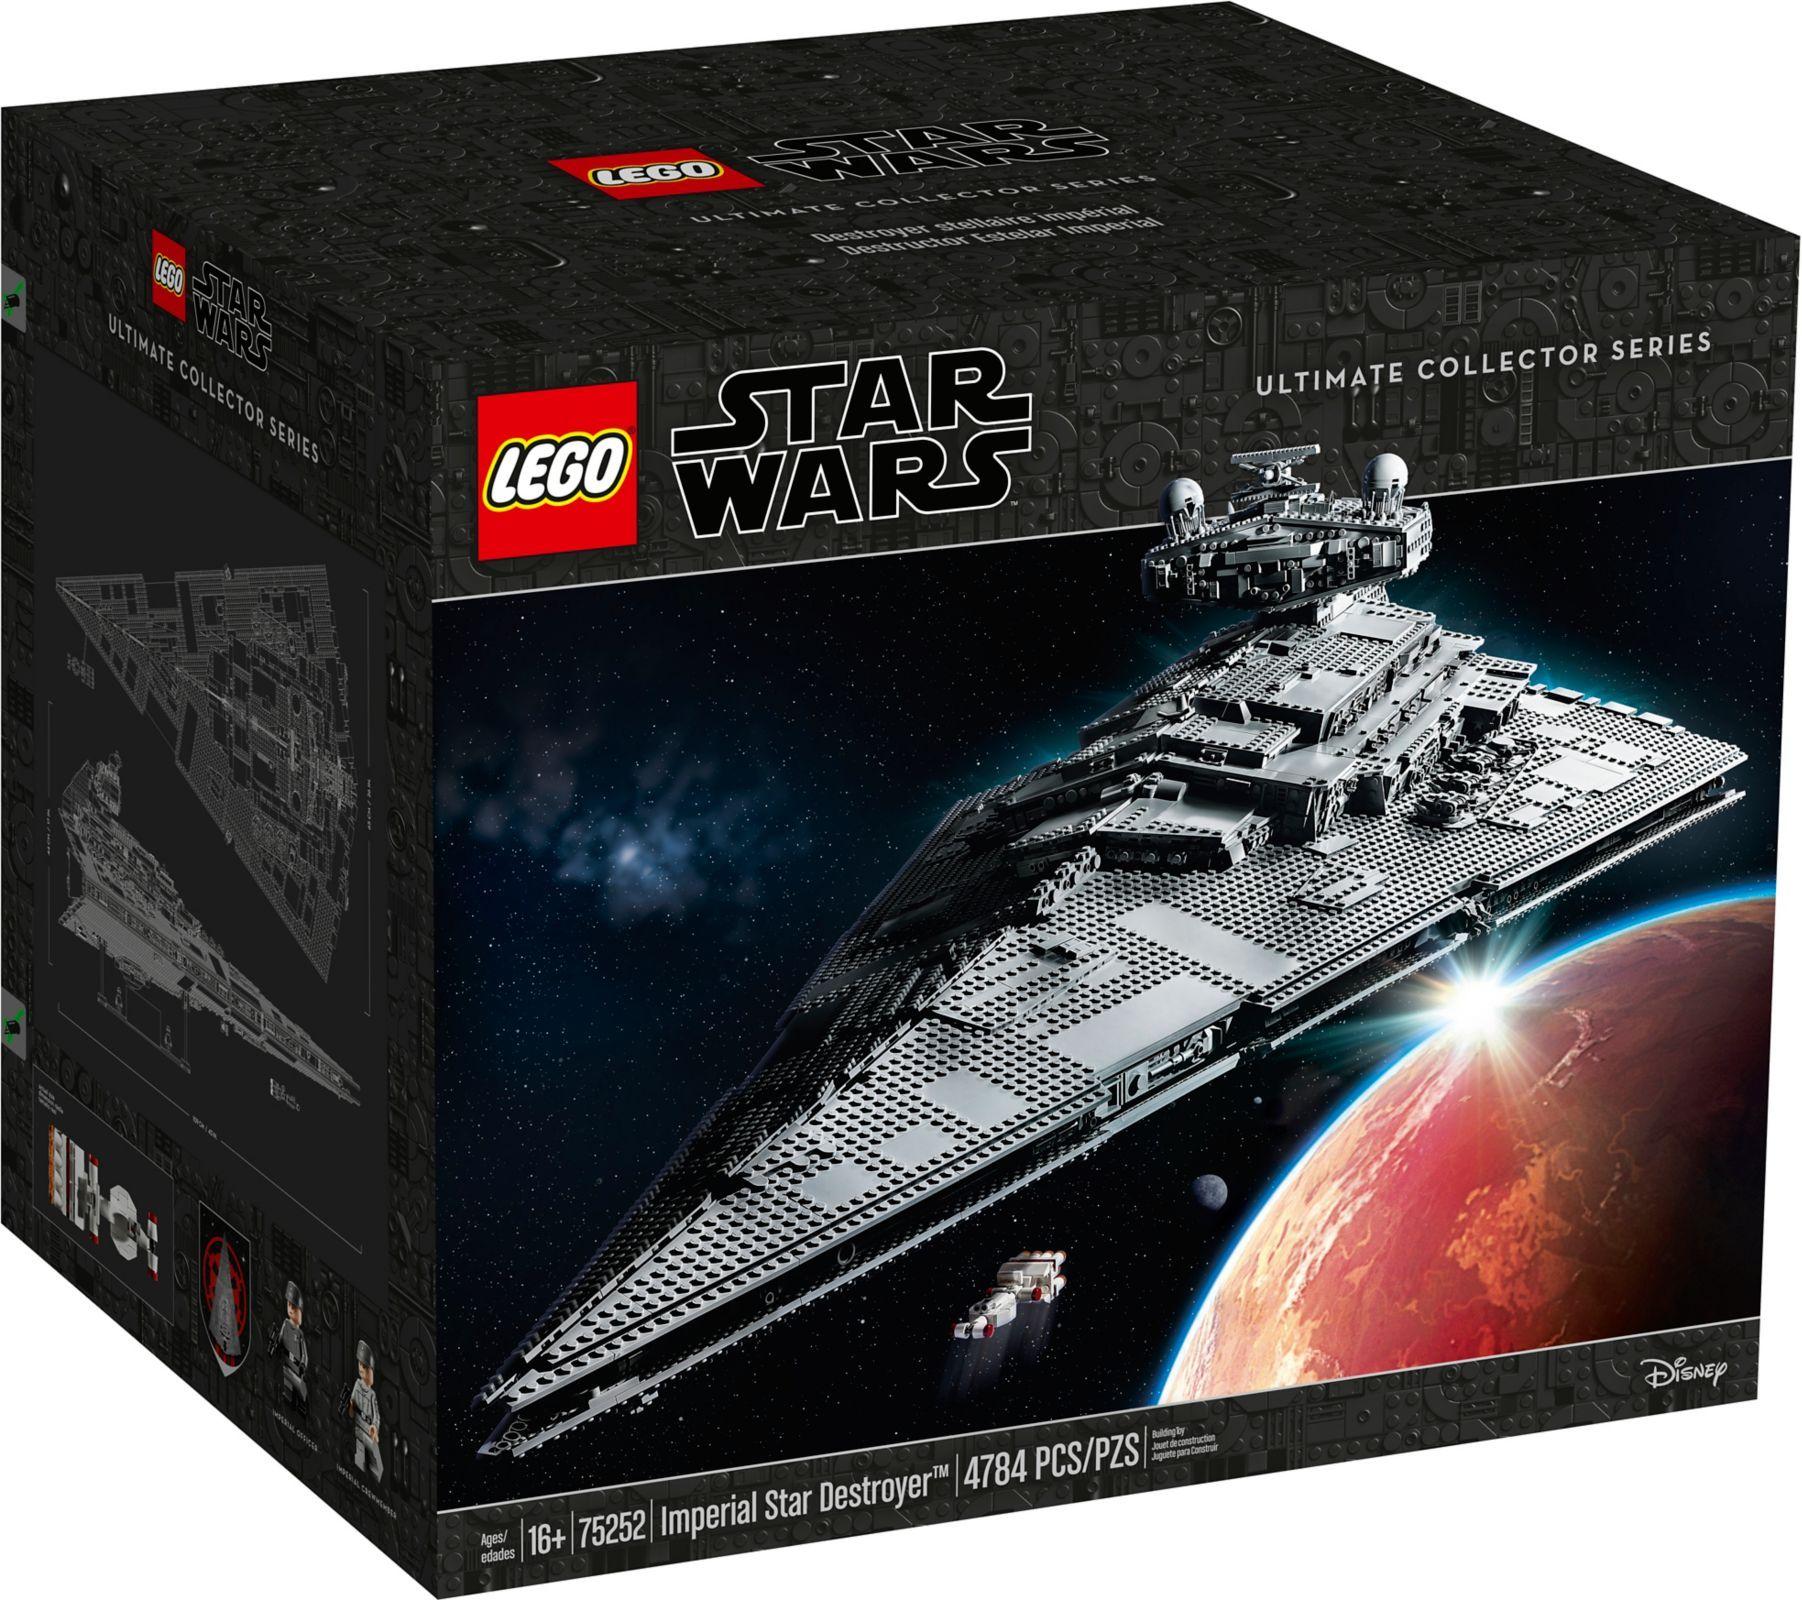 Lego Star Wars Star Destroyer 2019